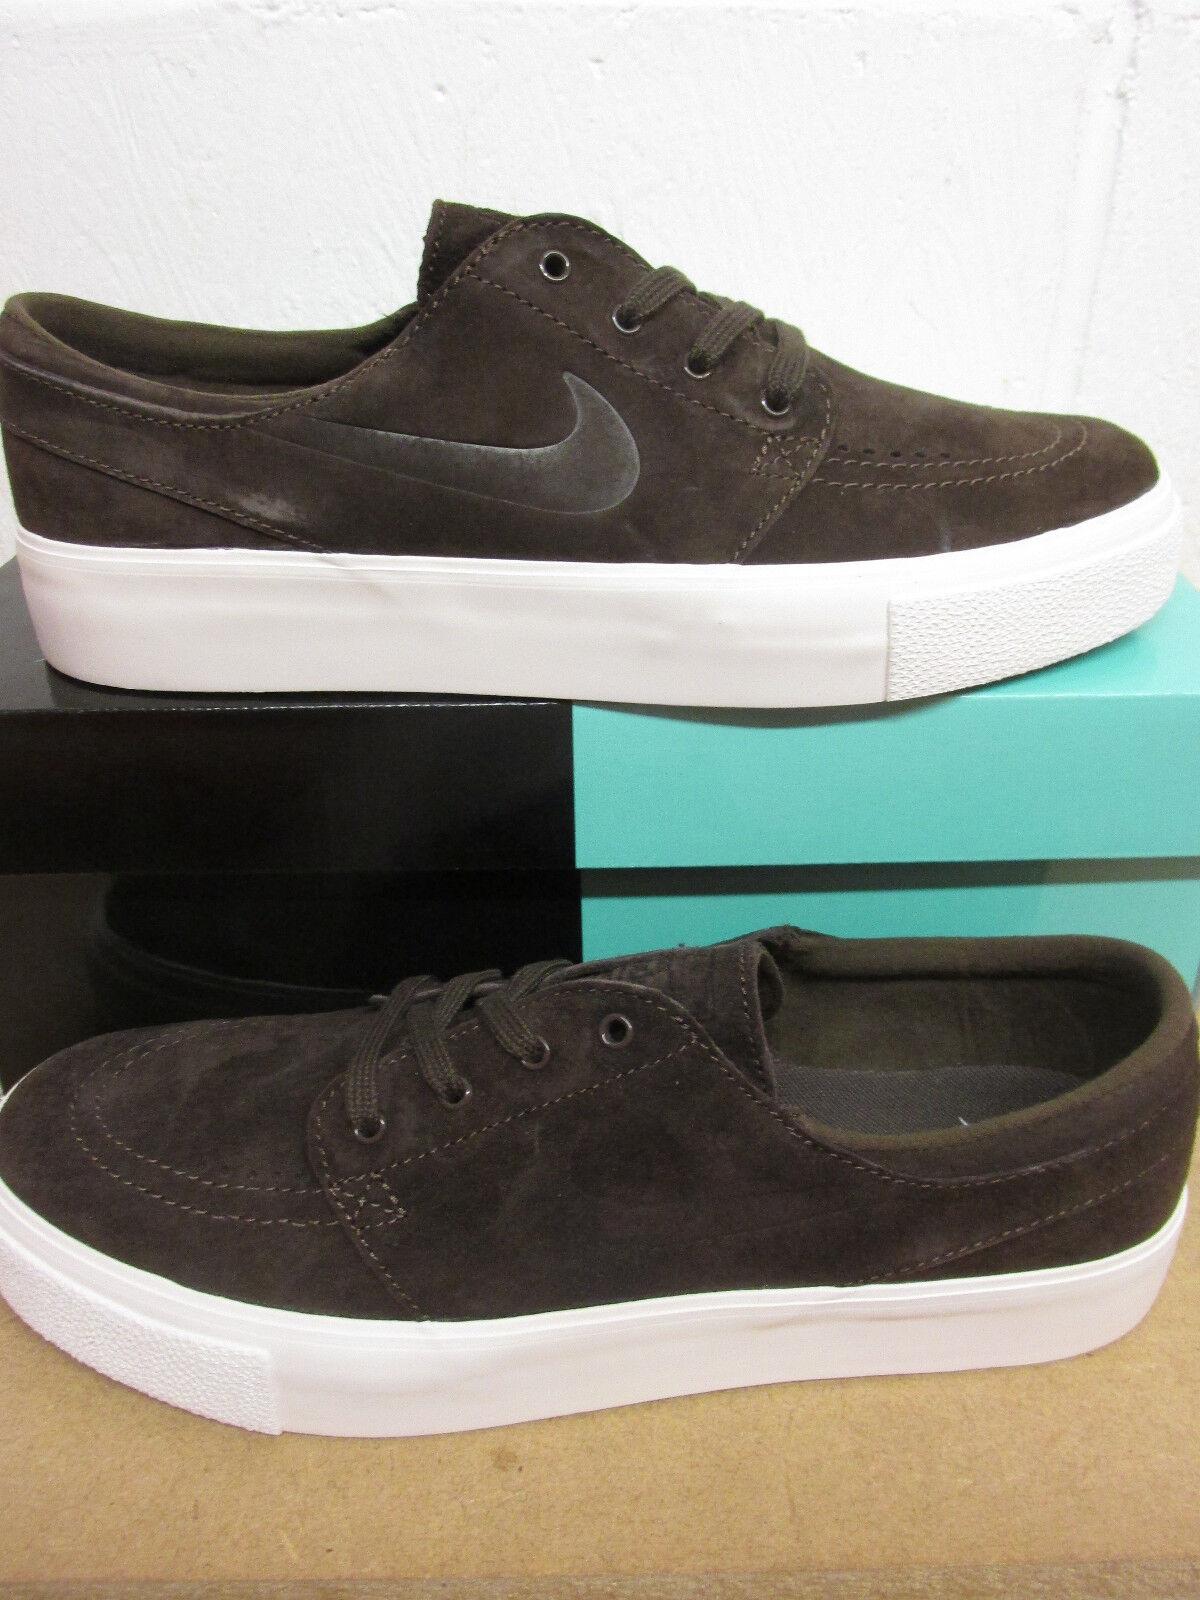 Nike SB Zoom Stefan Janoski Prem HT Zapatos Zapatillas para hombre 854321 221 Tenis Zapatos HT 7ab79b